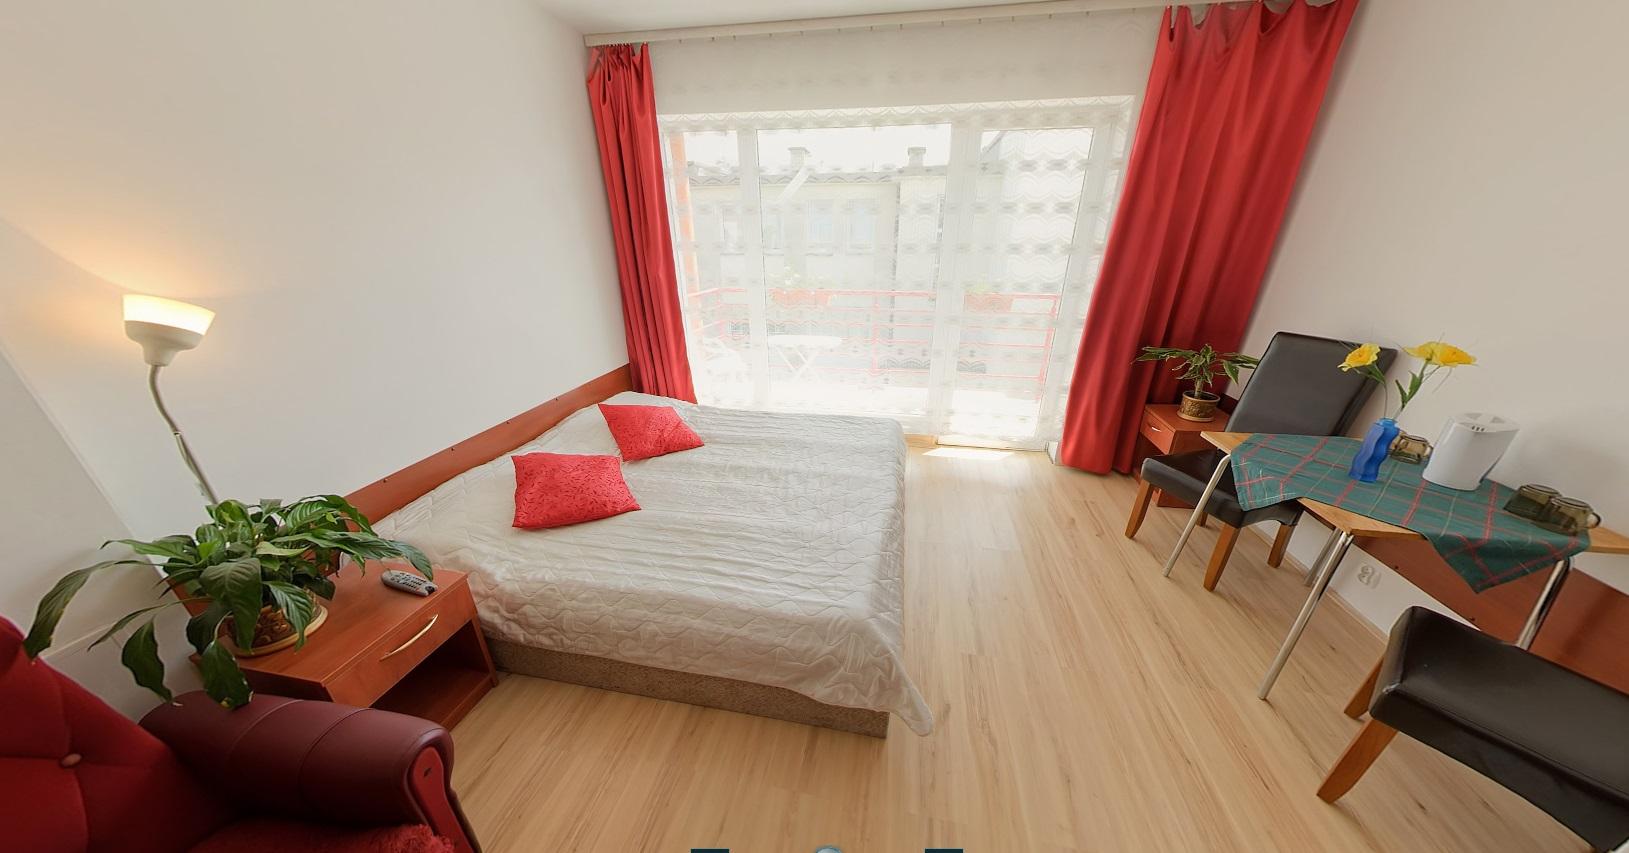 Pokoje w pensjonacie Willa Christina Mielno